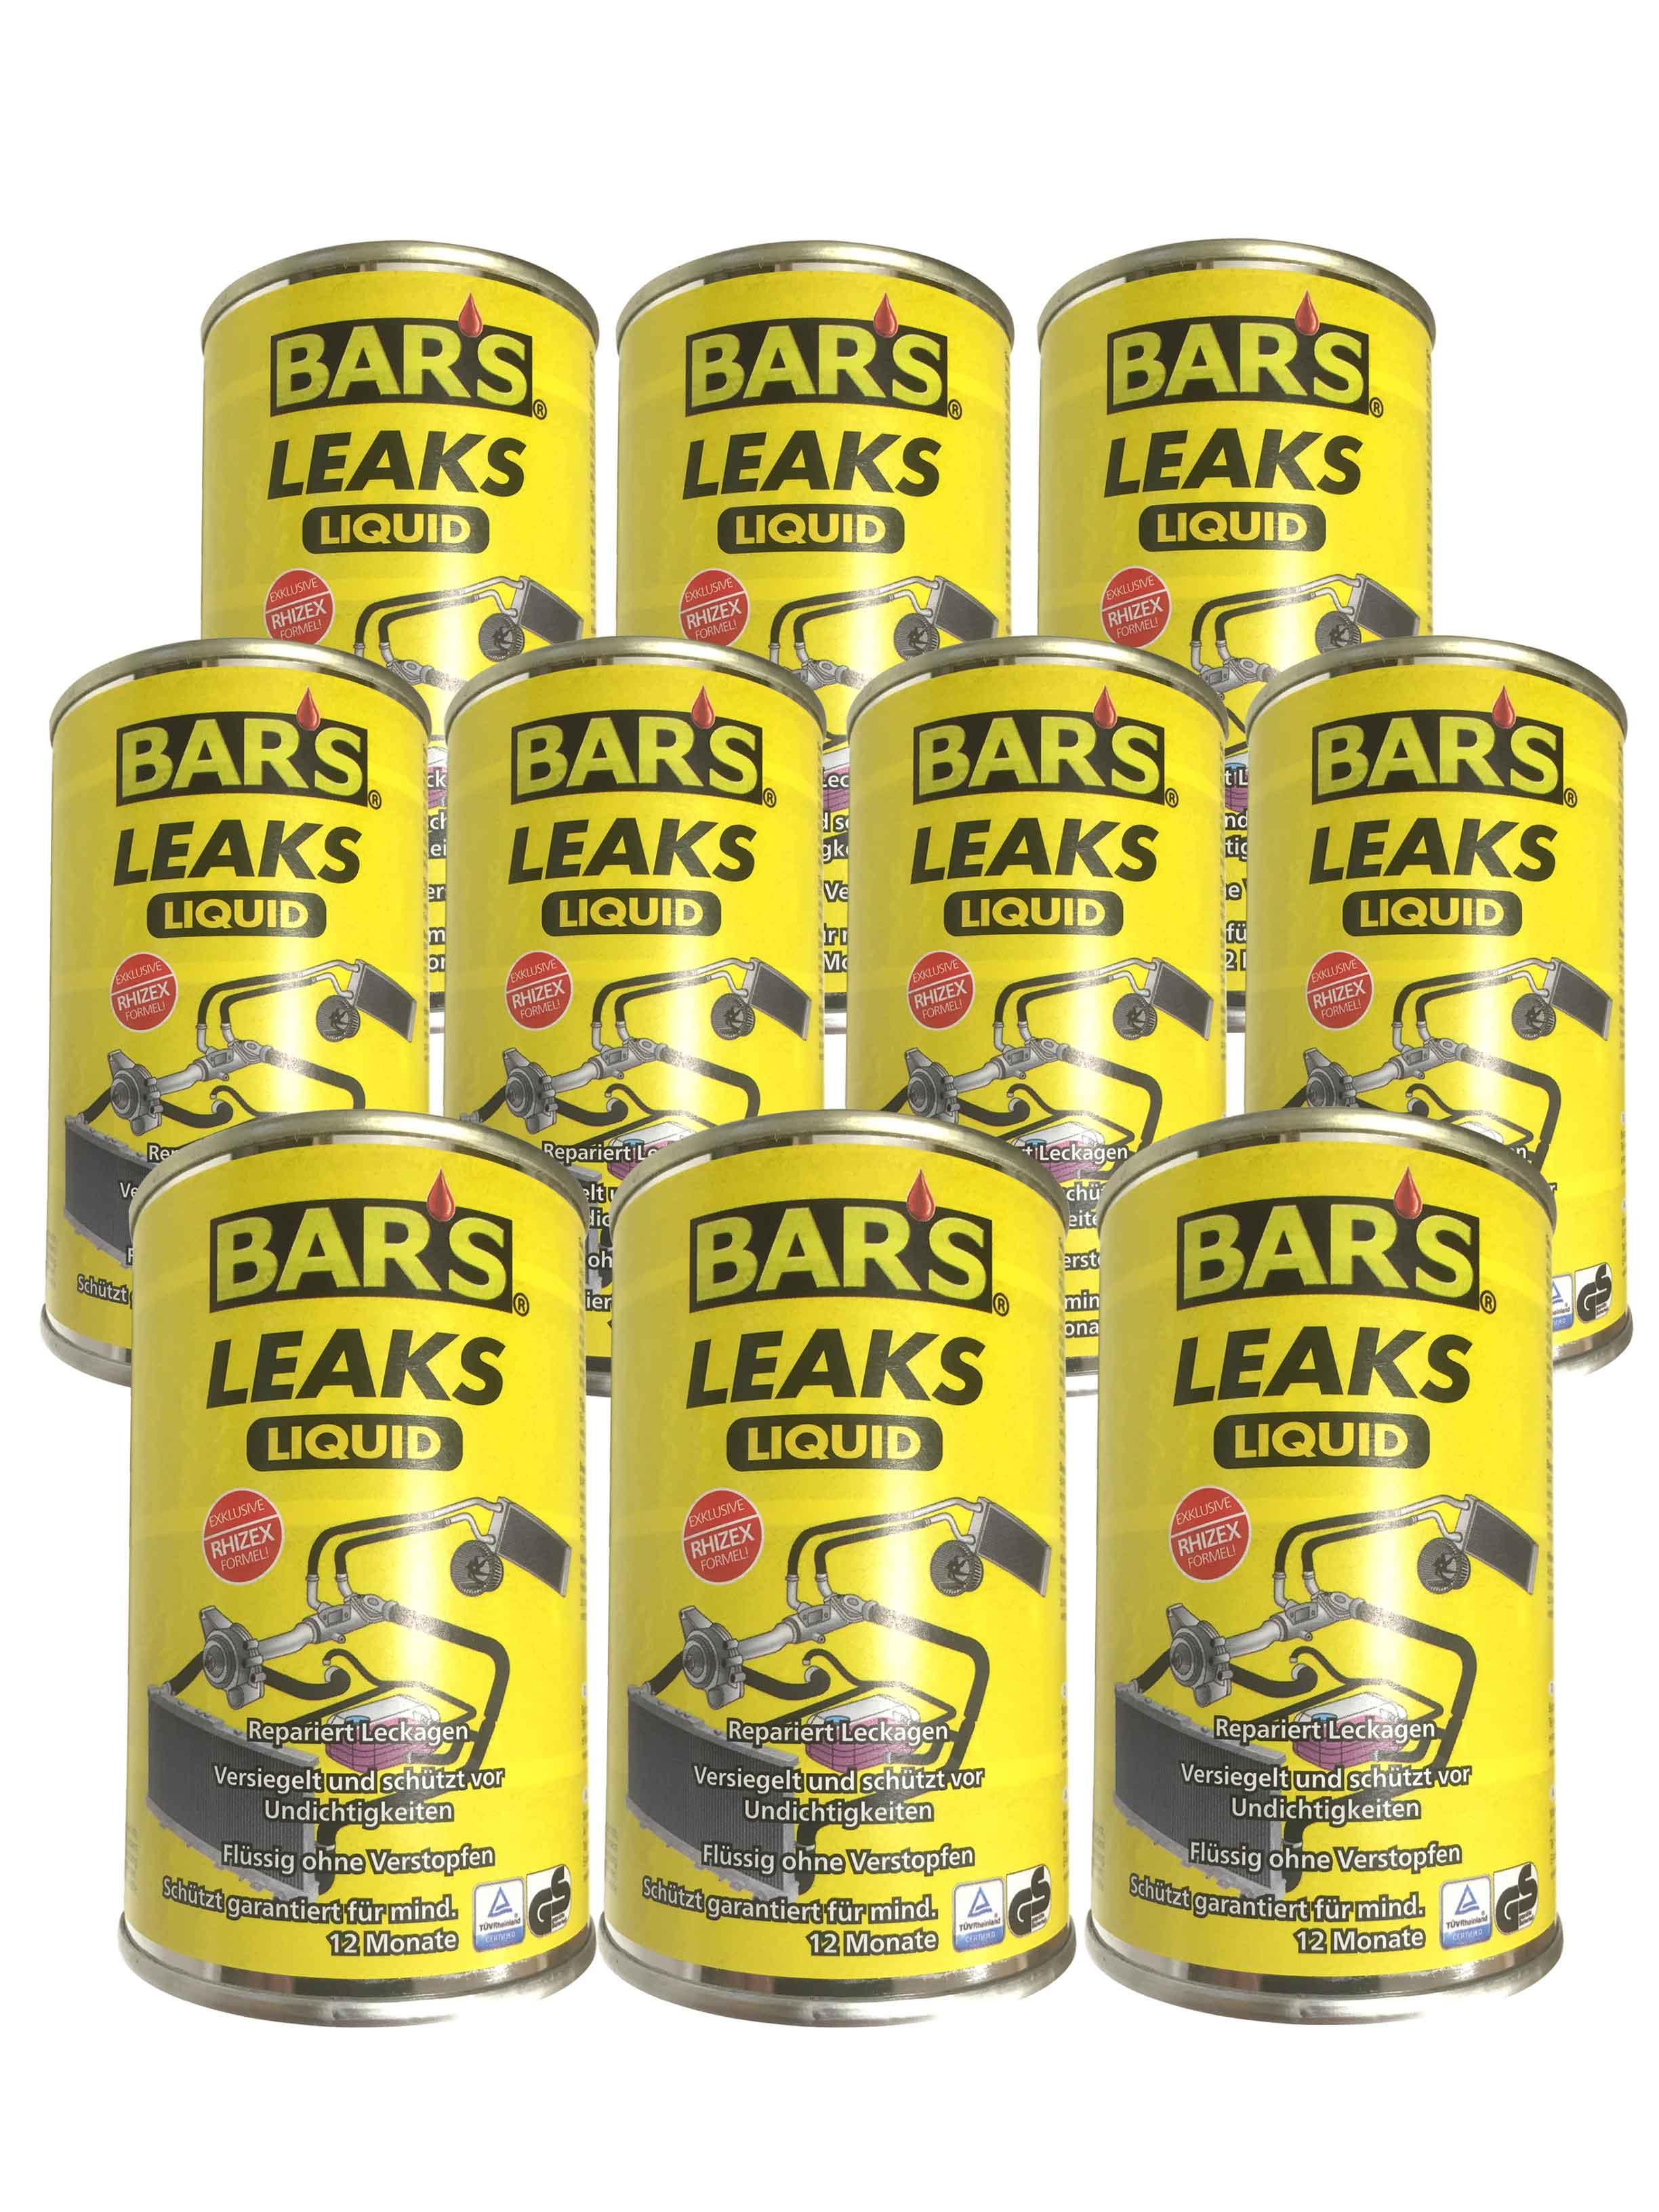 10x Dr. Wack BARS Leaks Liquid Kühlerdichtung Kühlerdichtmittel 150g